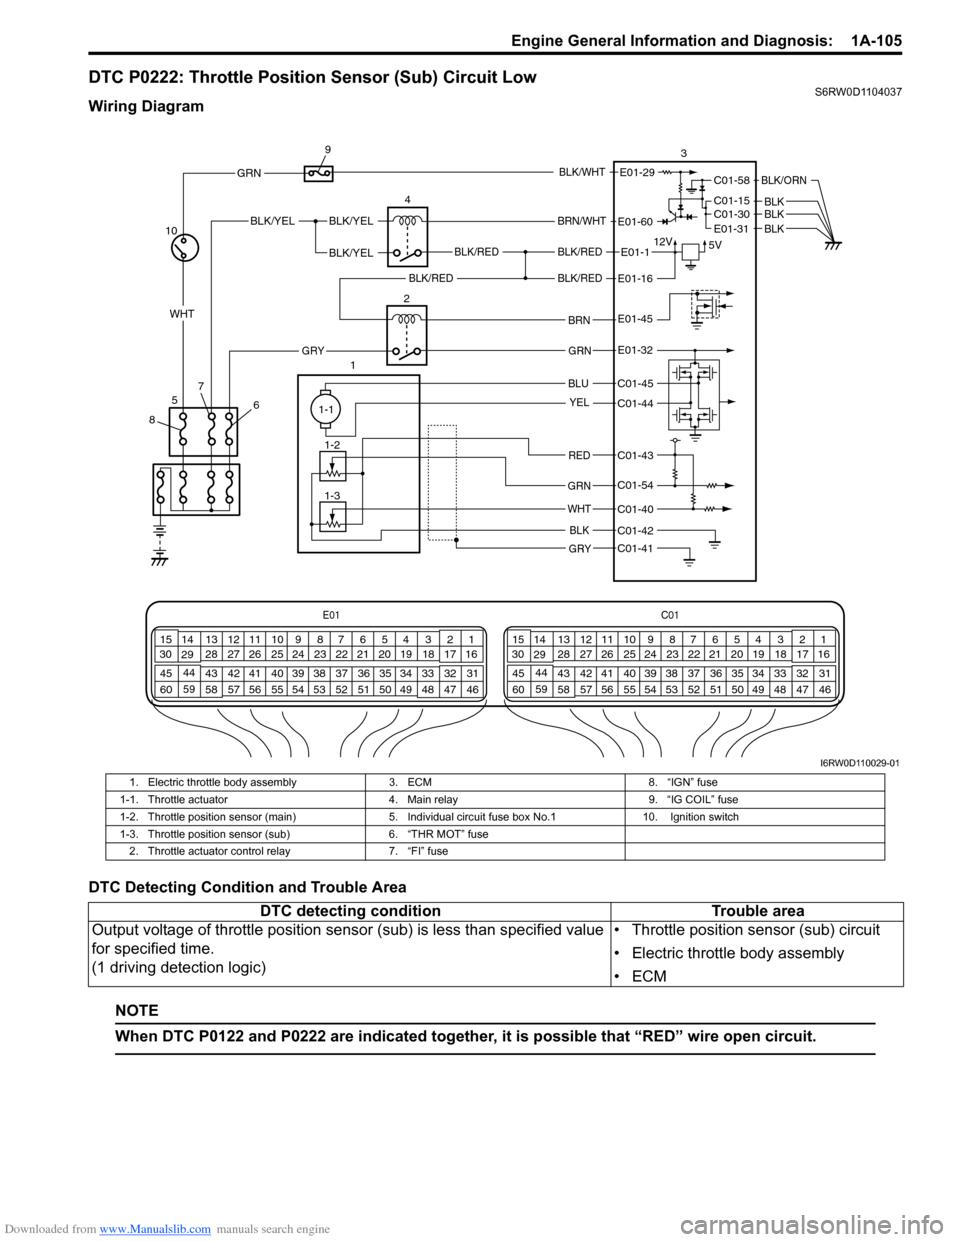 hight resolution of suzuki sx4 fog light wiring diagram toyota tundra fog aftermarket fog light wiring diagram basic wiring diagram fog light